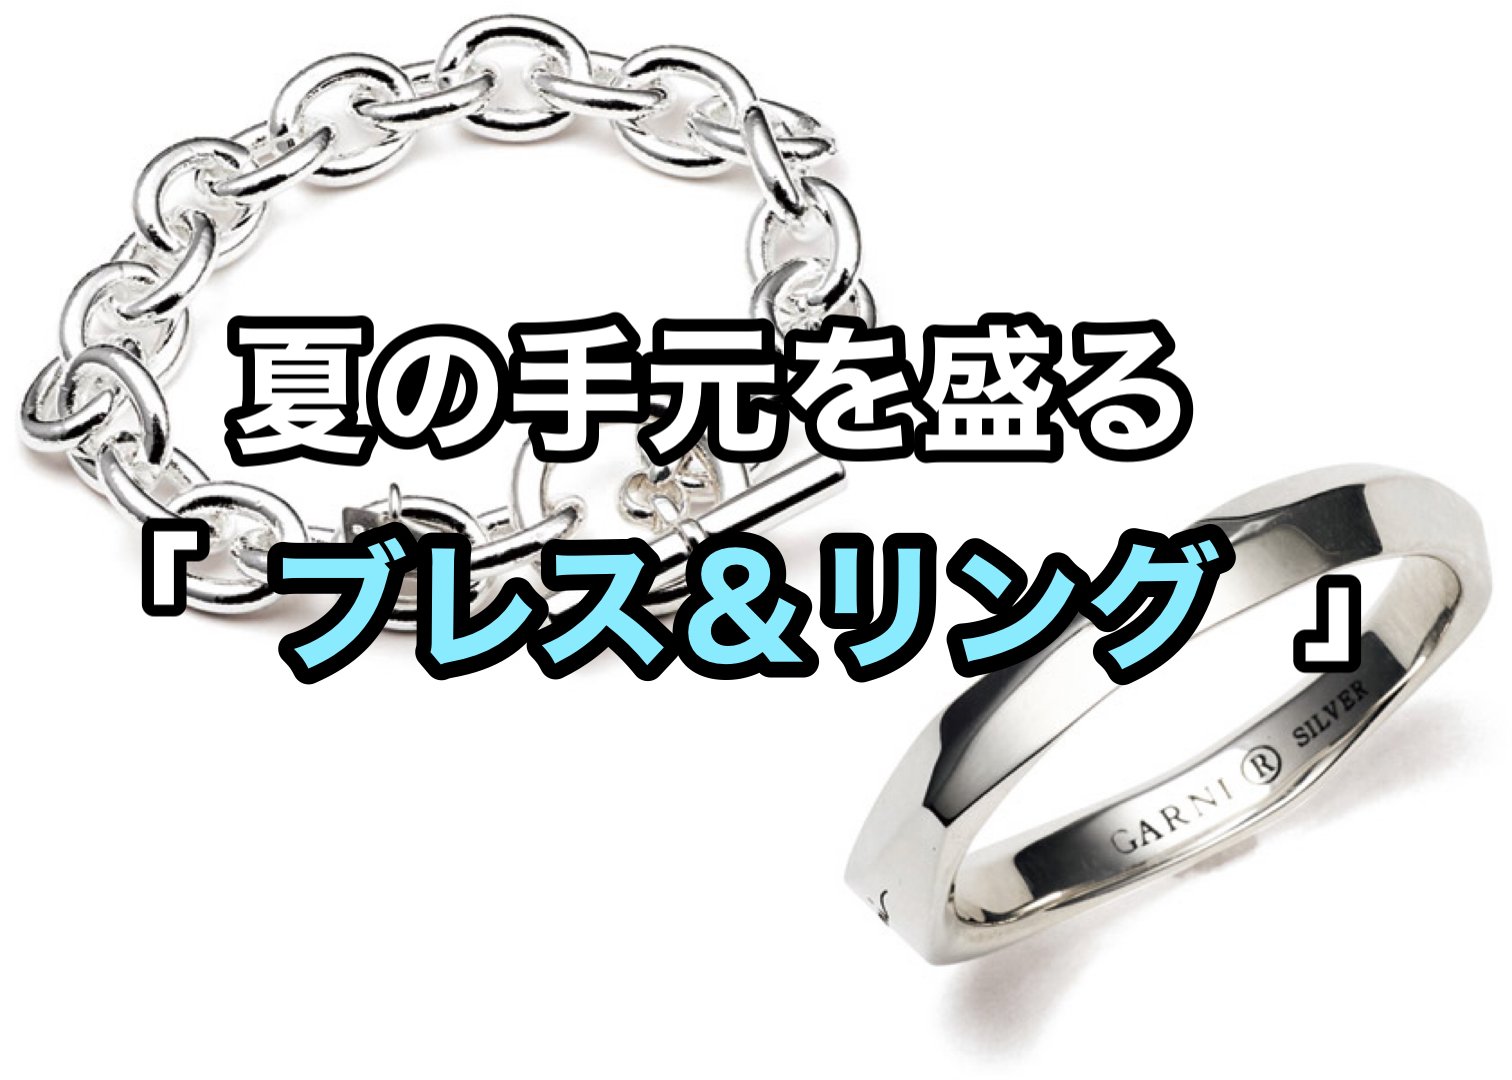 https://cdn.fineboys-online.jp/thegear/content/theme/img/org/article/3471/main.jpg?t=1625033647